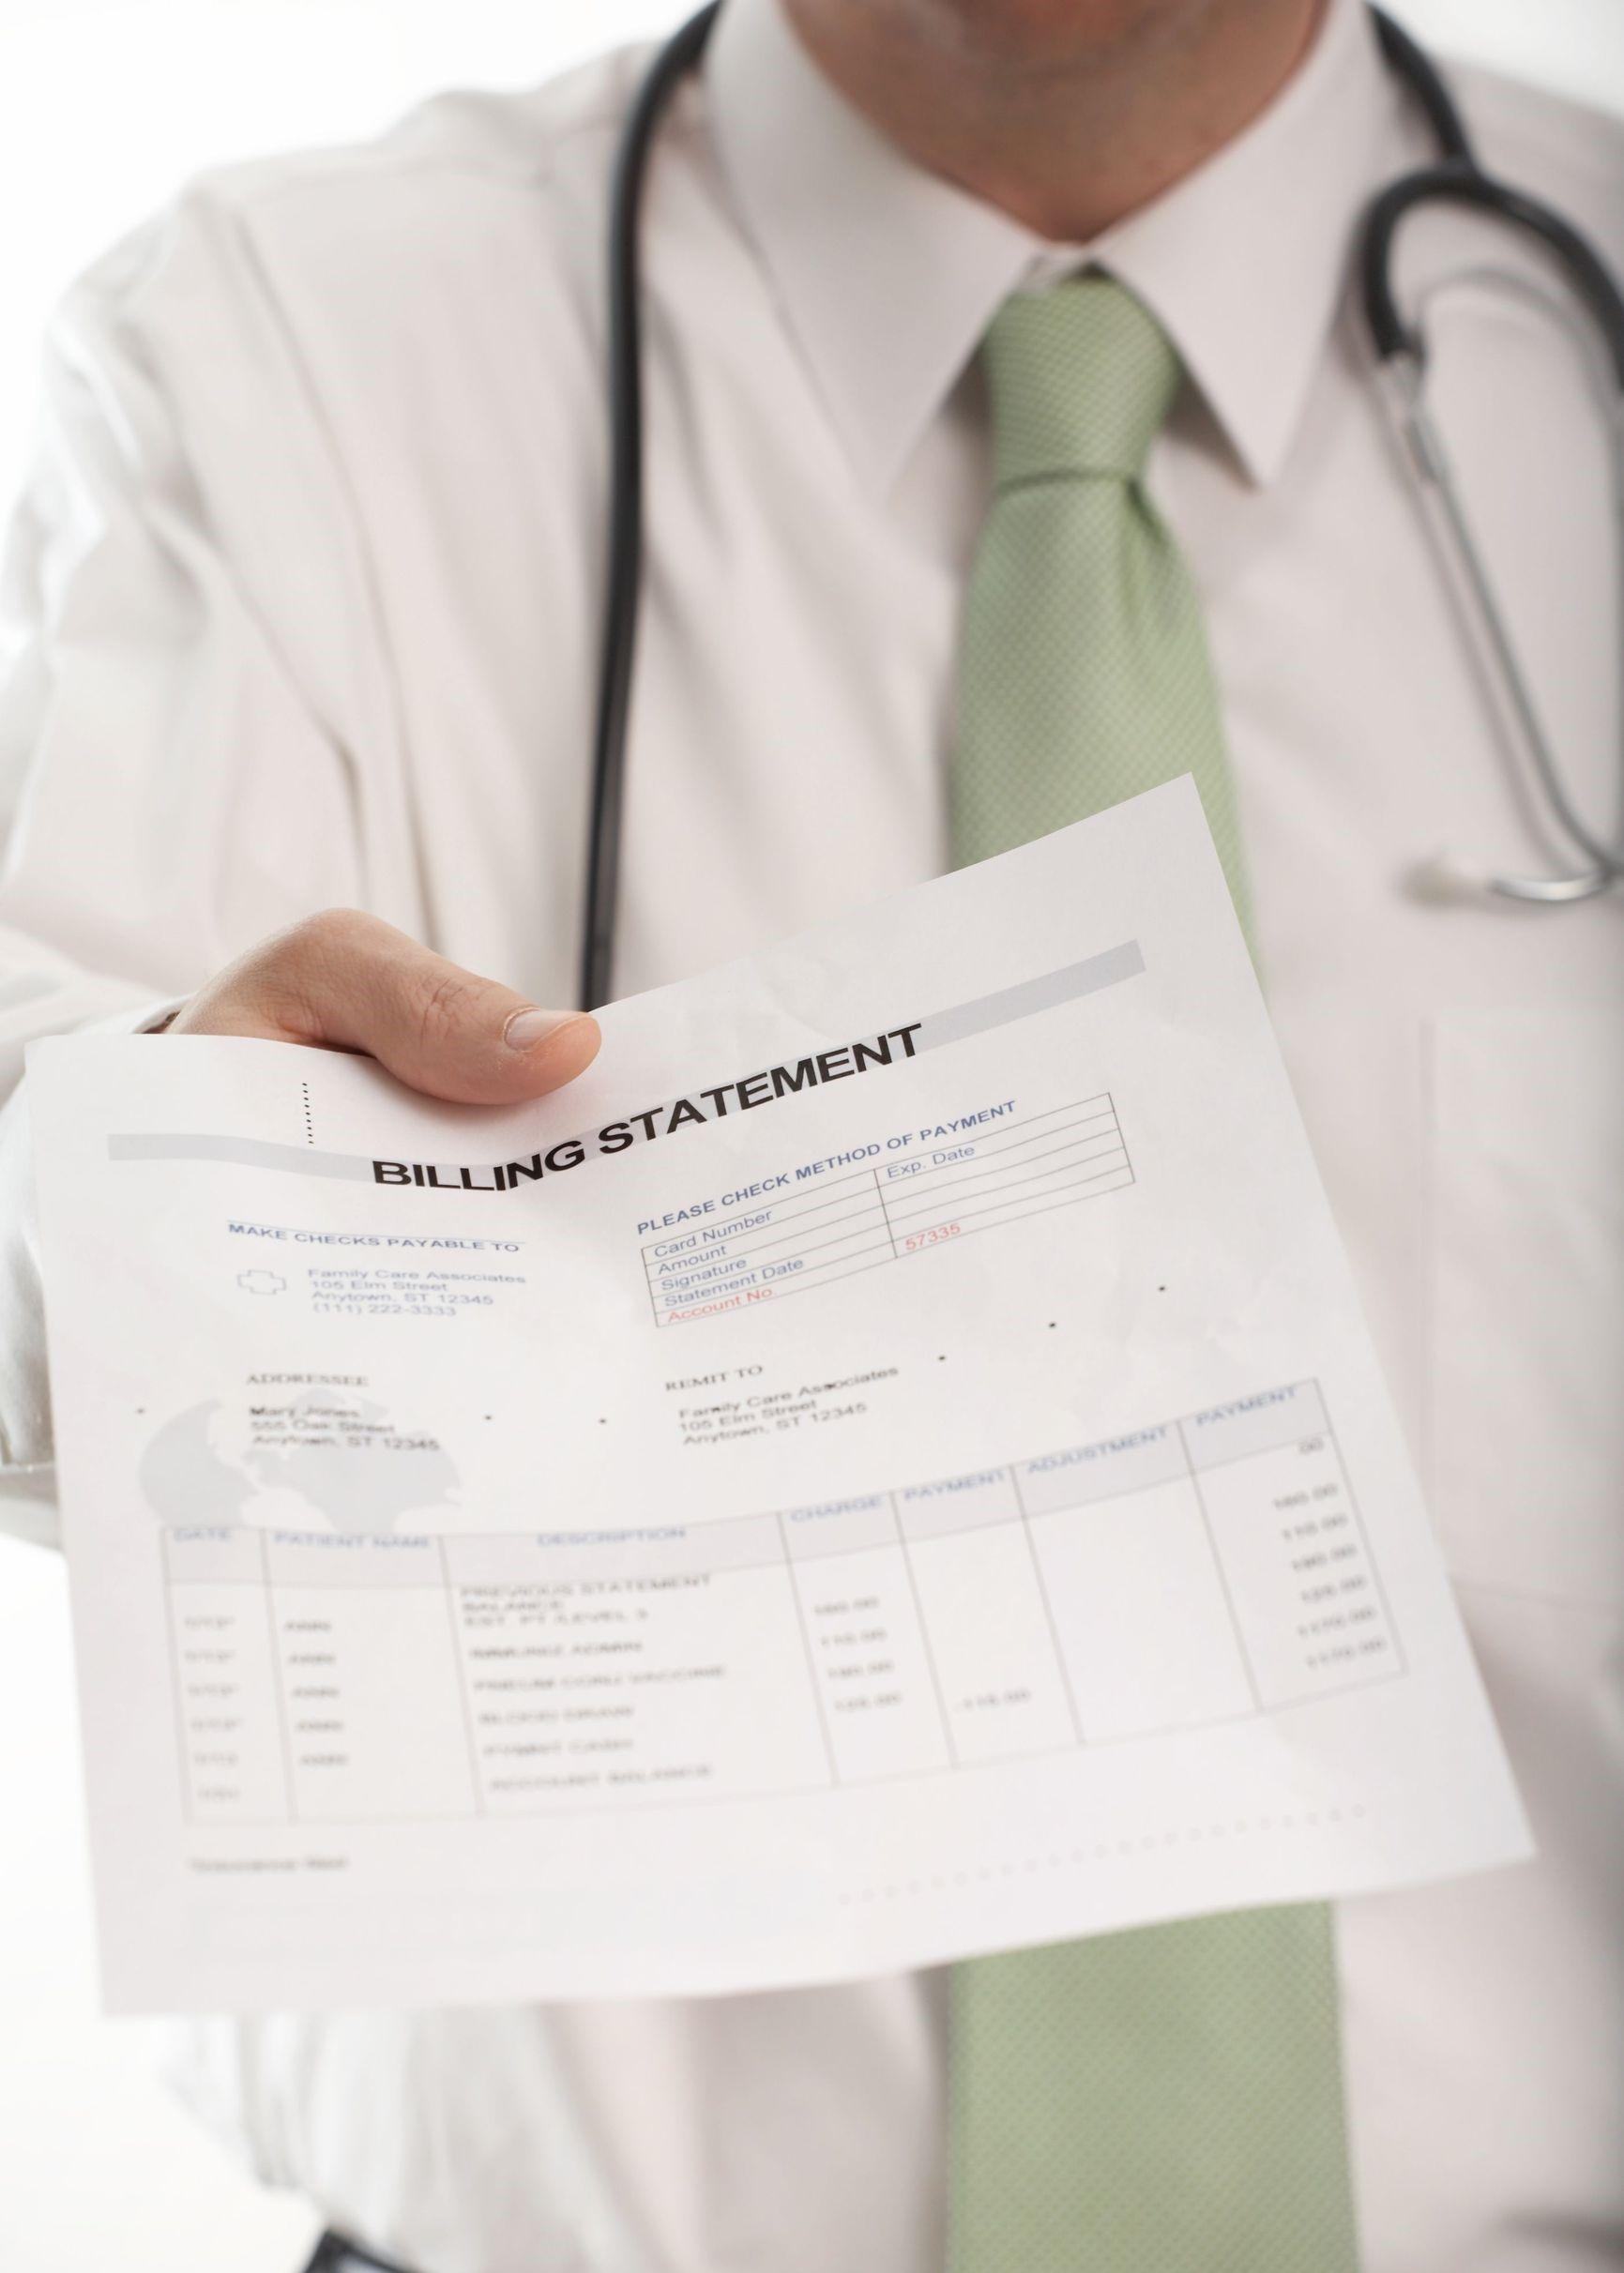 Cruise Medical Malpractice Attorney